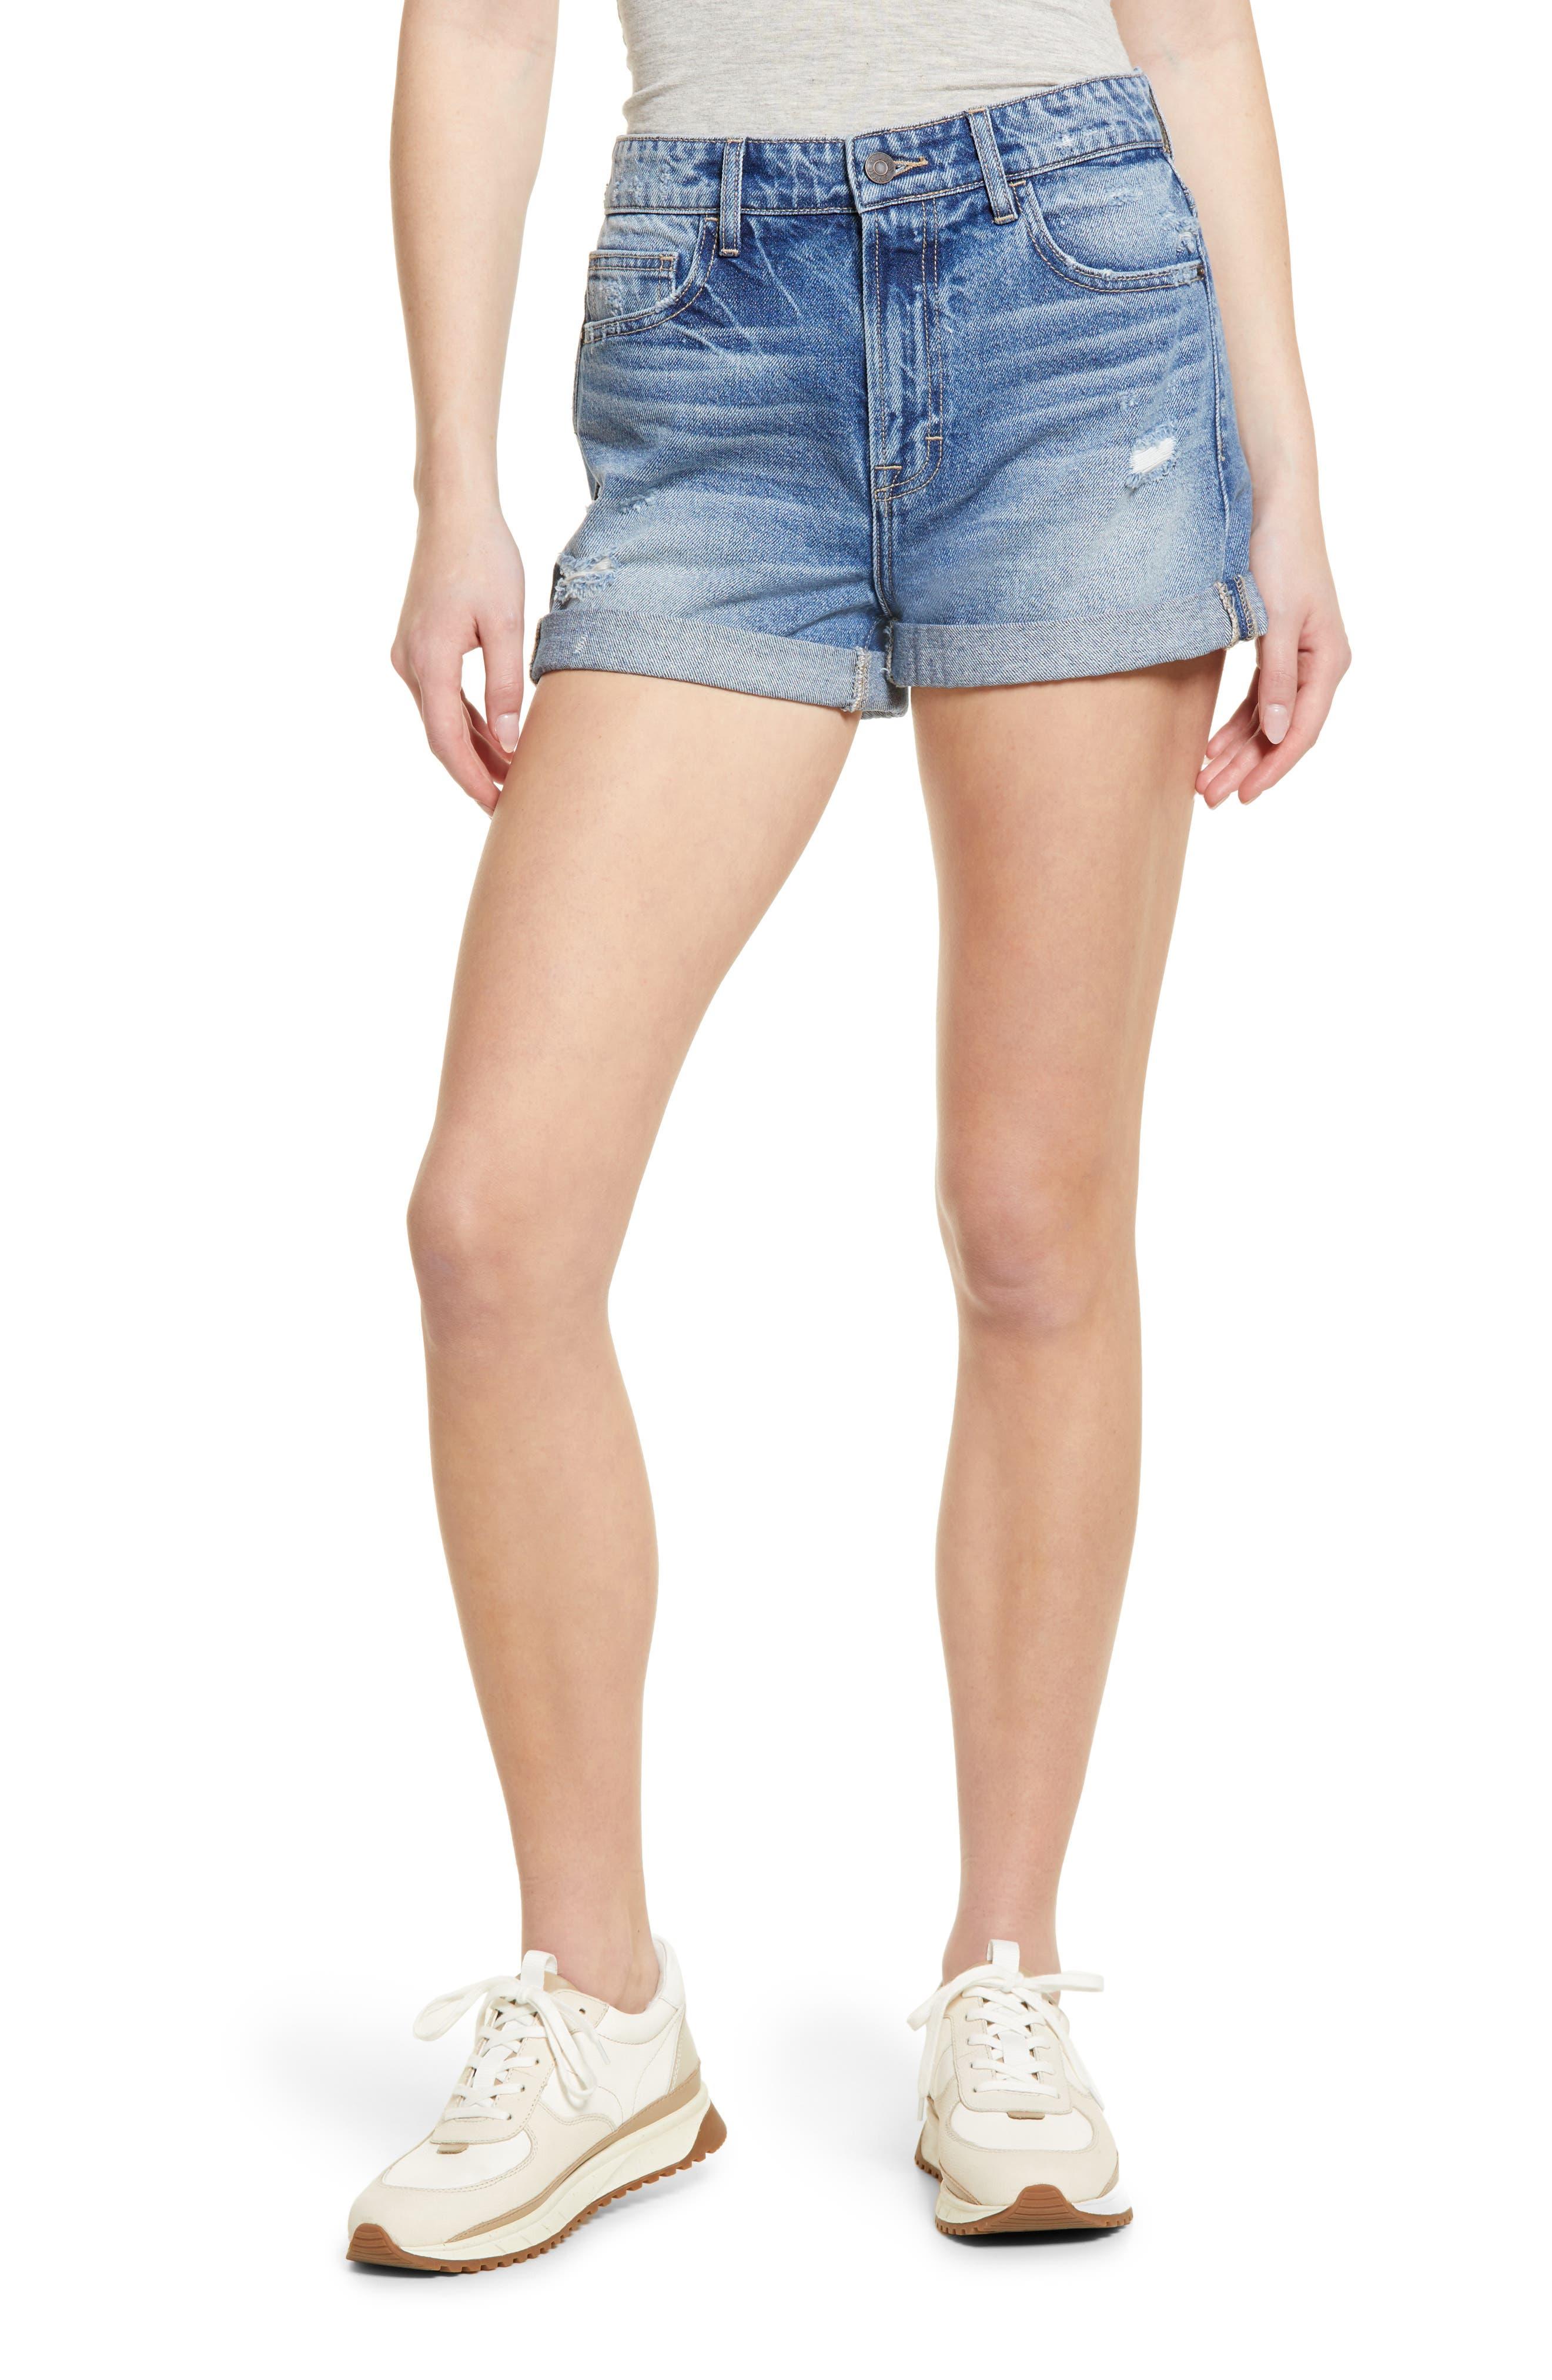 Classic Cuffed Boyfriend Denim Shorts